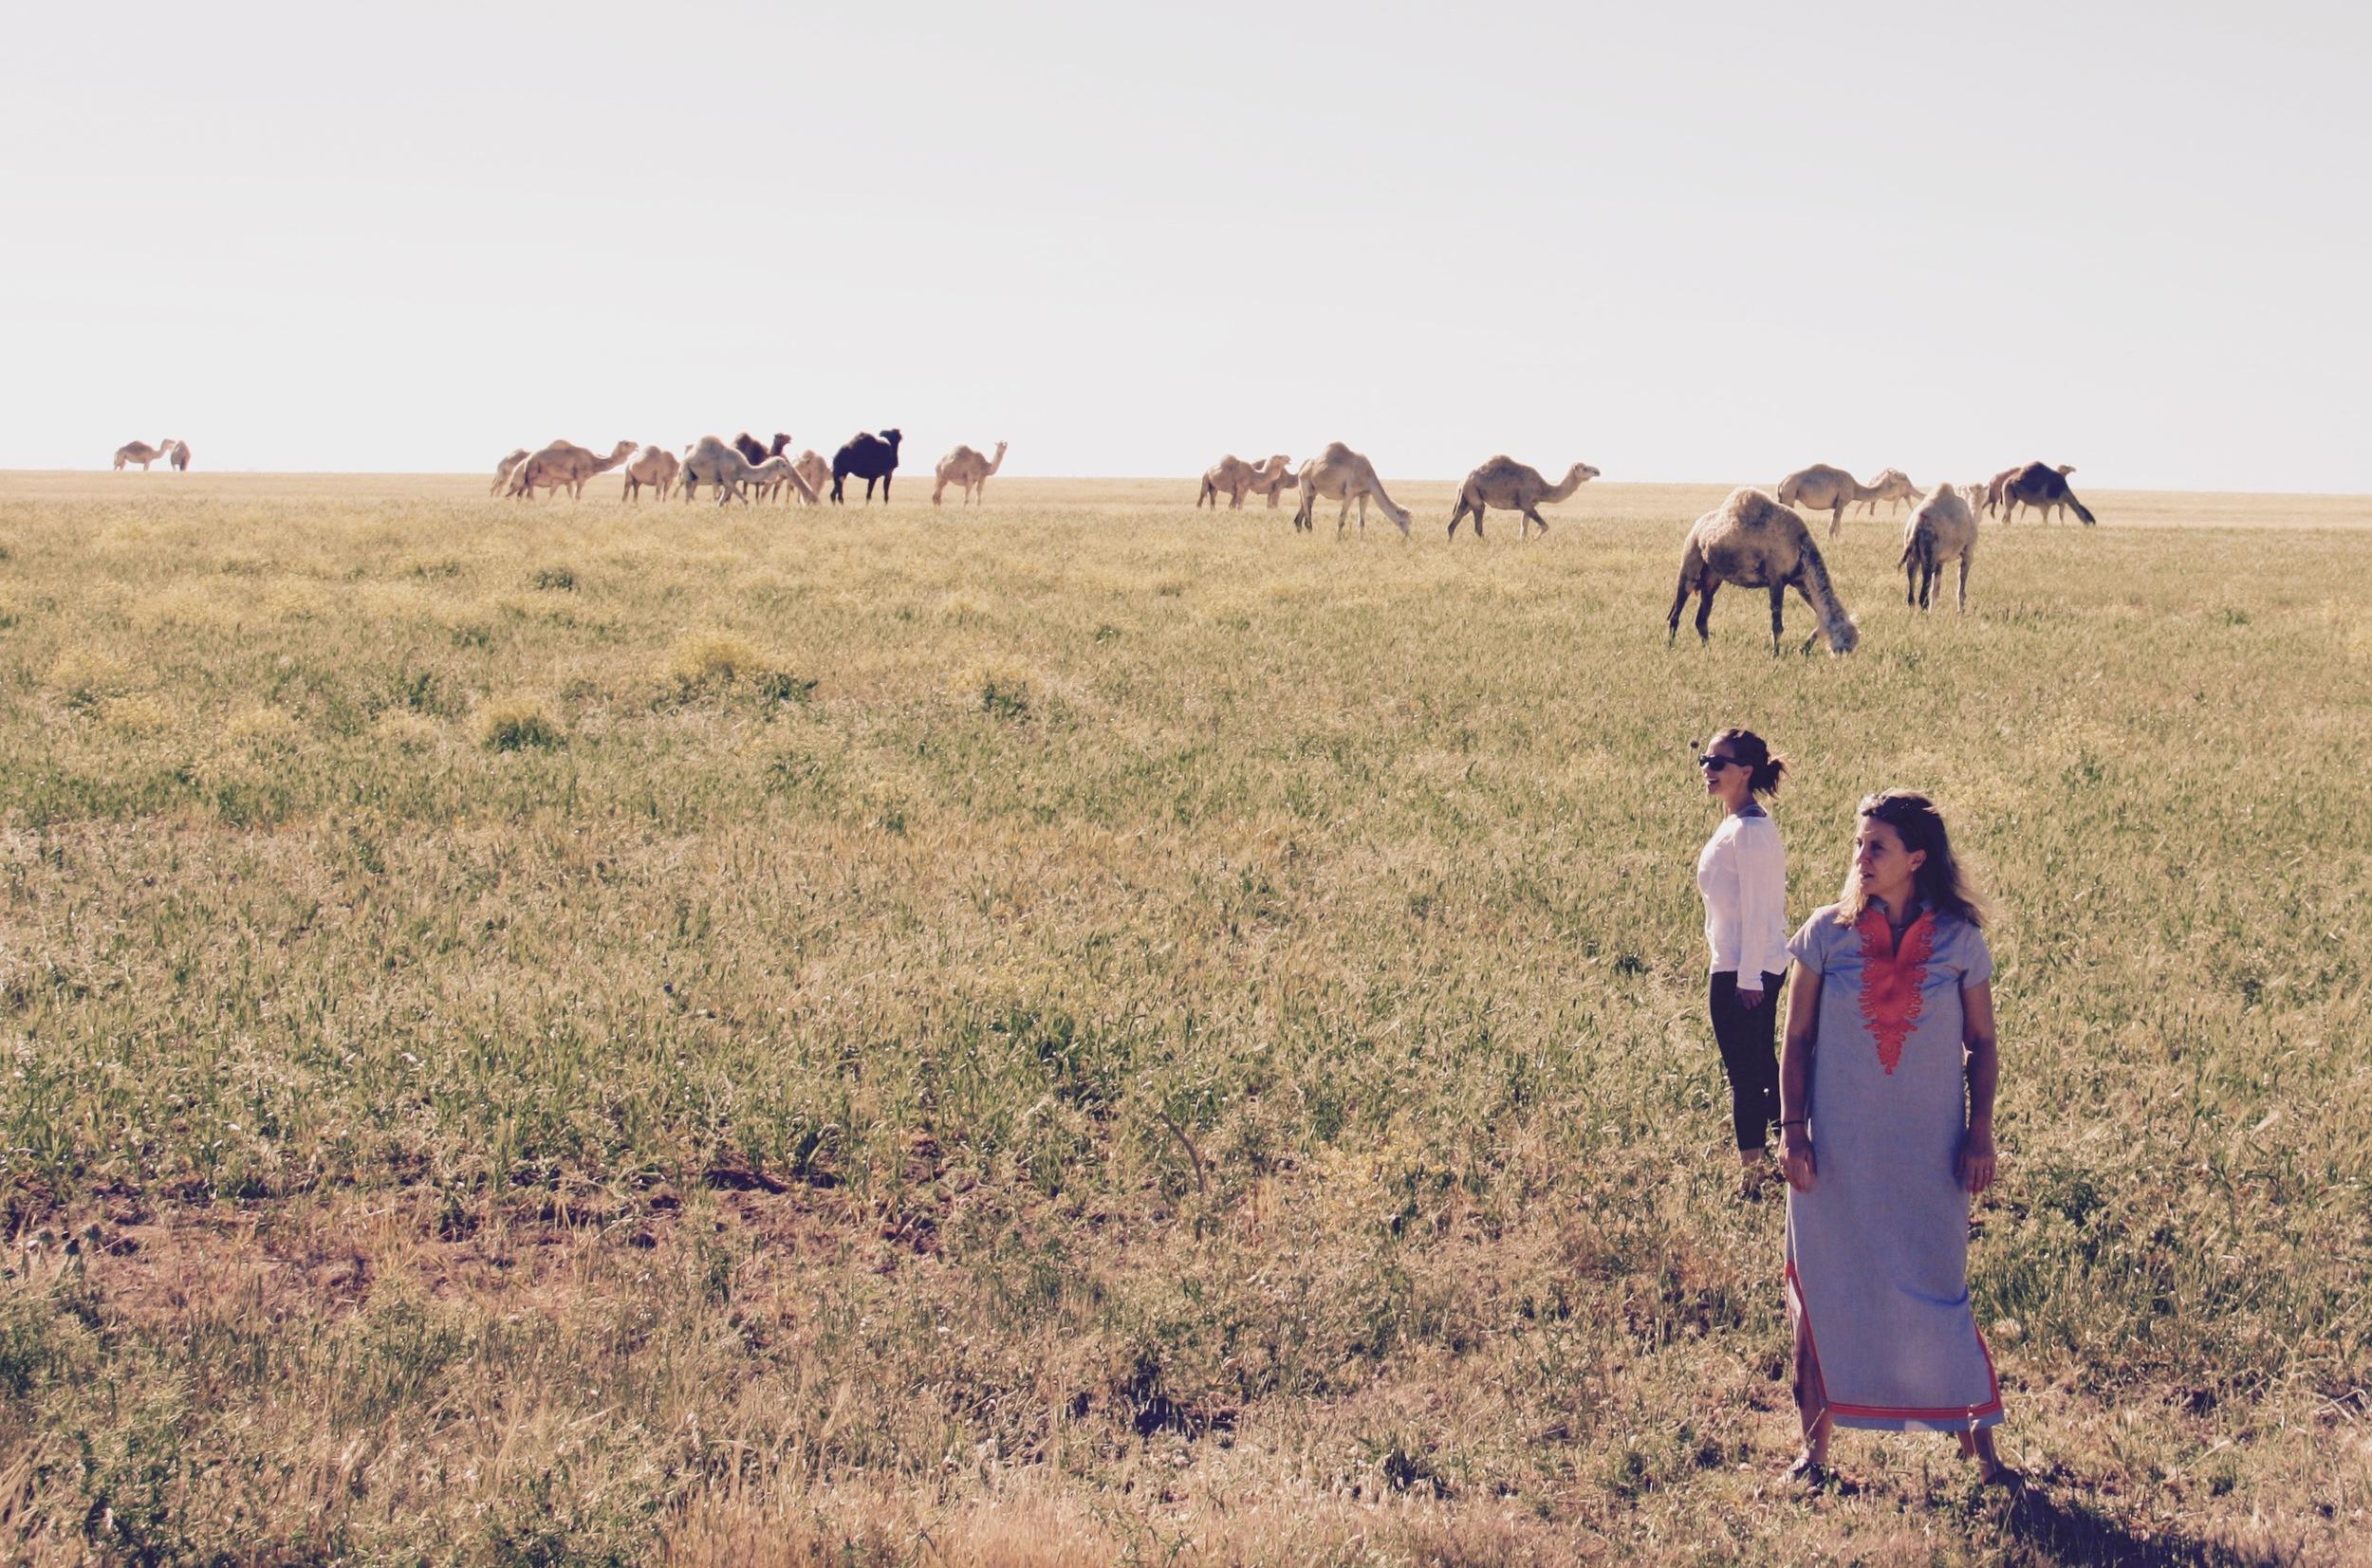 Wild Camels in the Jordanian Highlands - 3 Days*